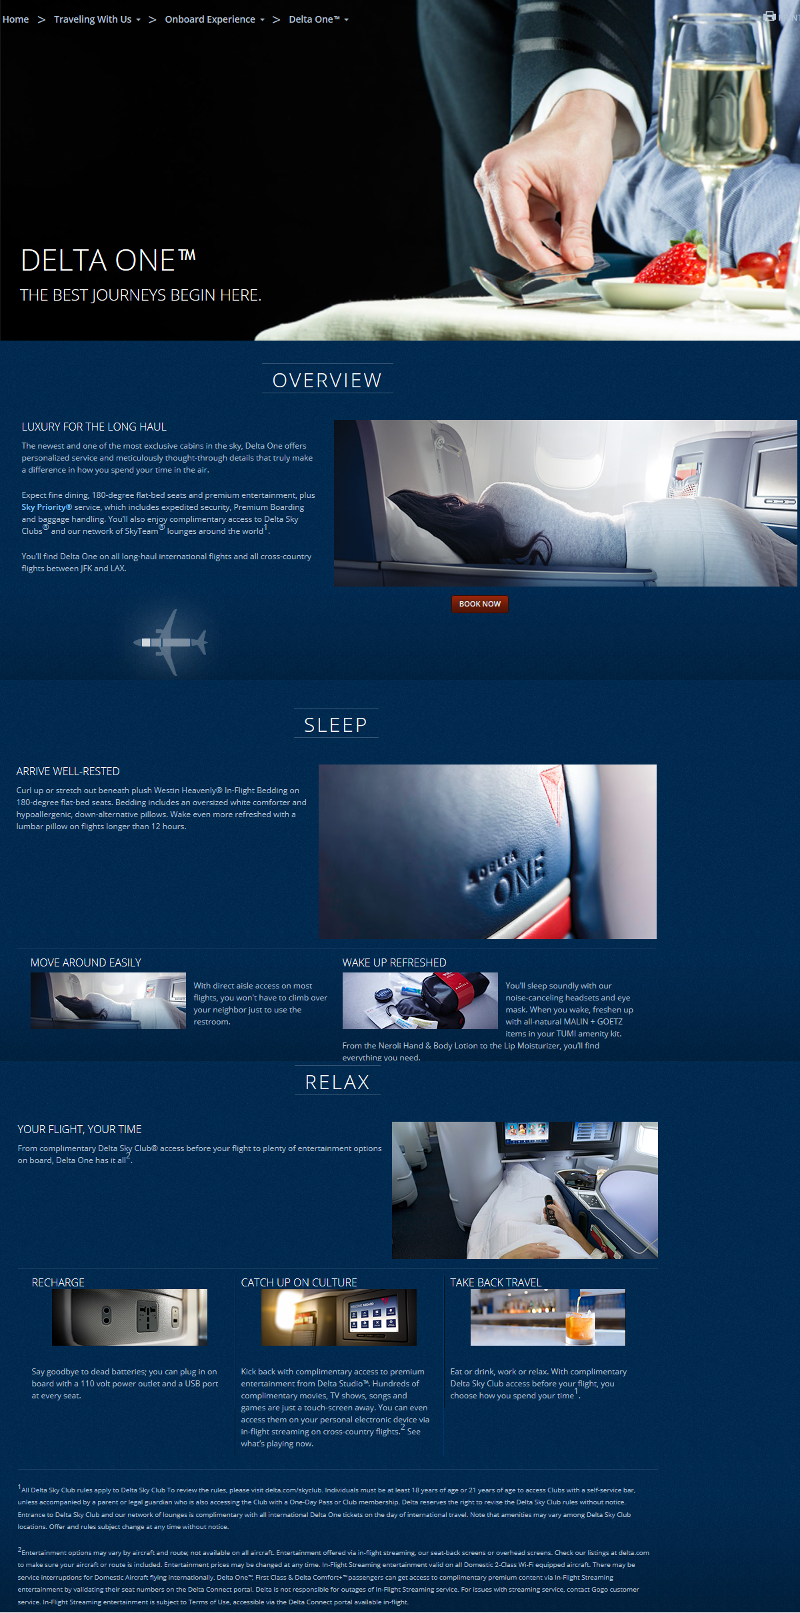 Delta Air Lines Businesselite First Class 747 400 Domestic Nov30 Fll Atl Msp Atl Fll Flyertalk Forums,Apartment Patio Decorating Ideas On A Budget